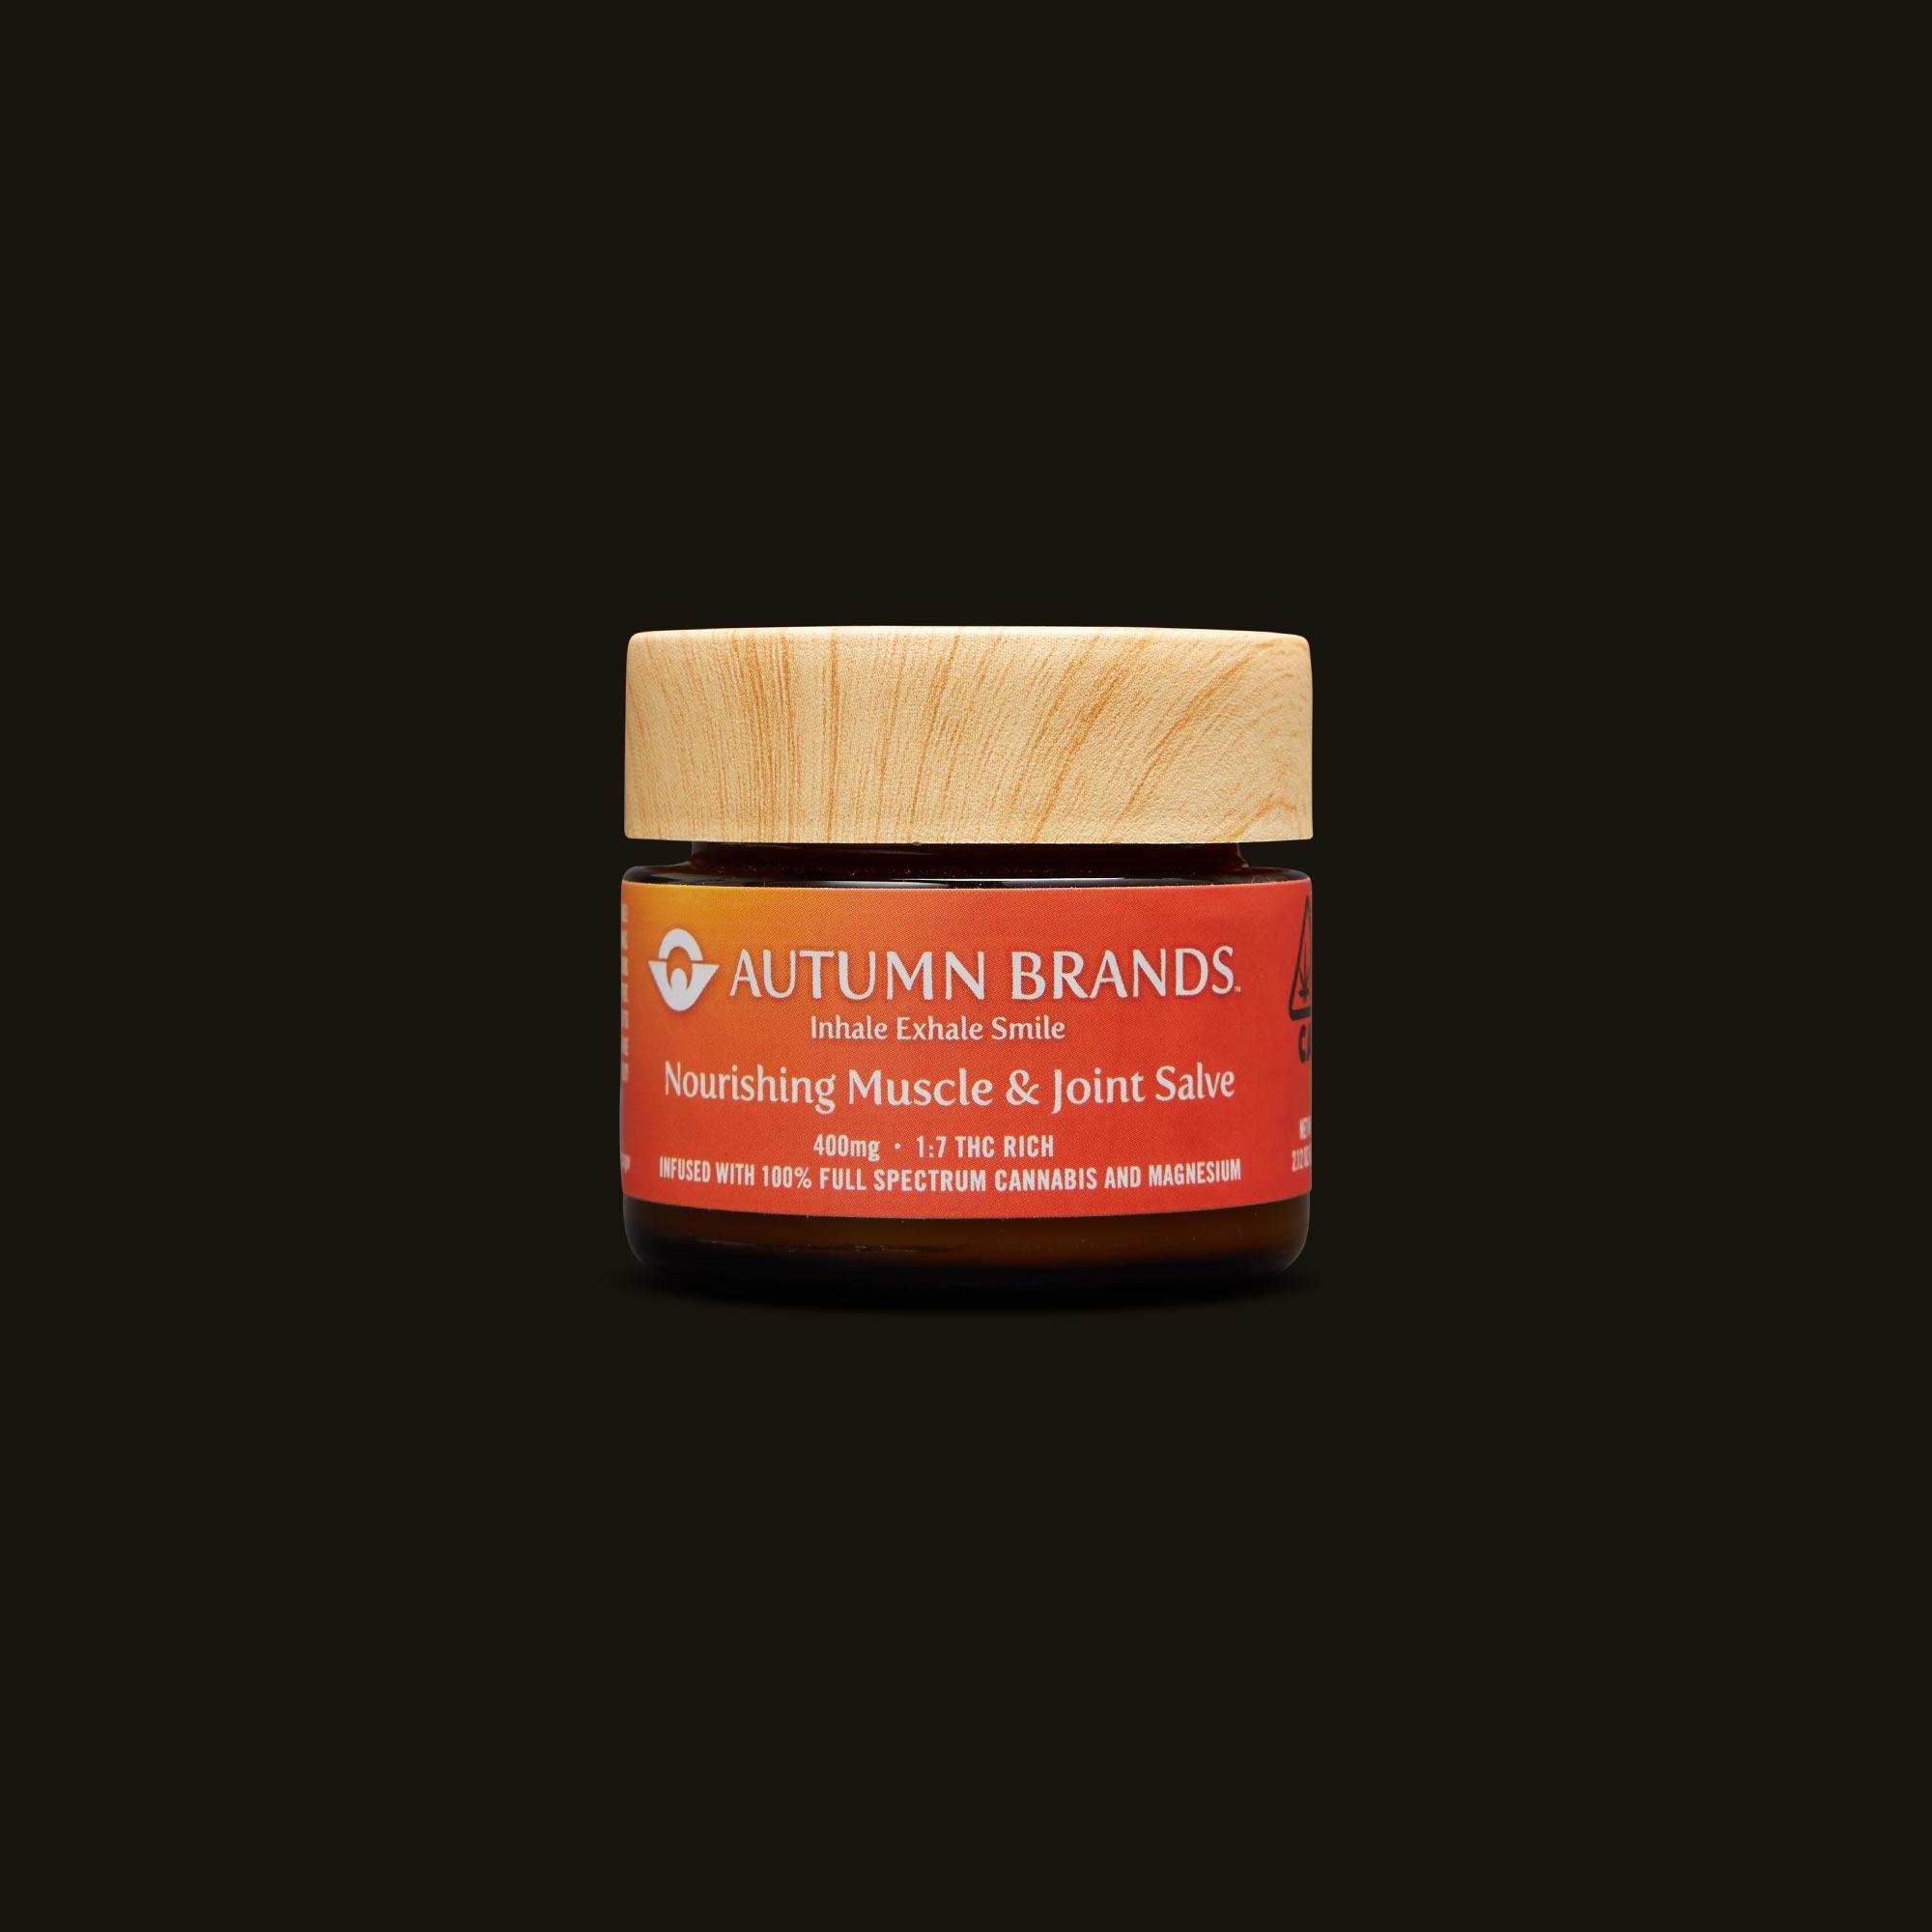 Autumn Brands Nourishing Muscle & Joint Salve